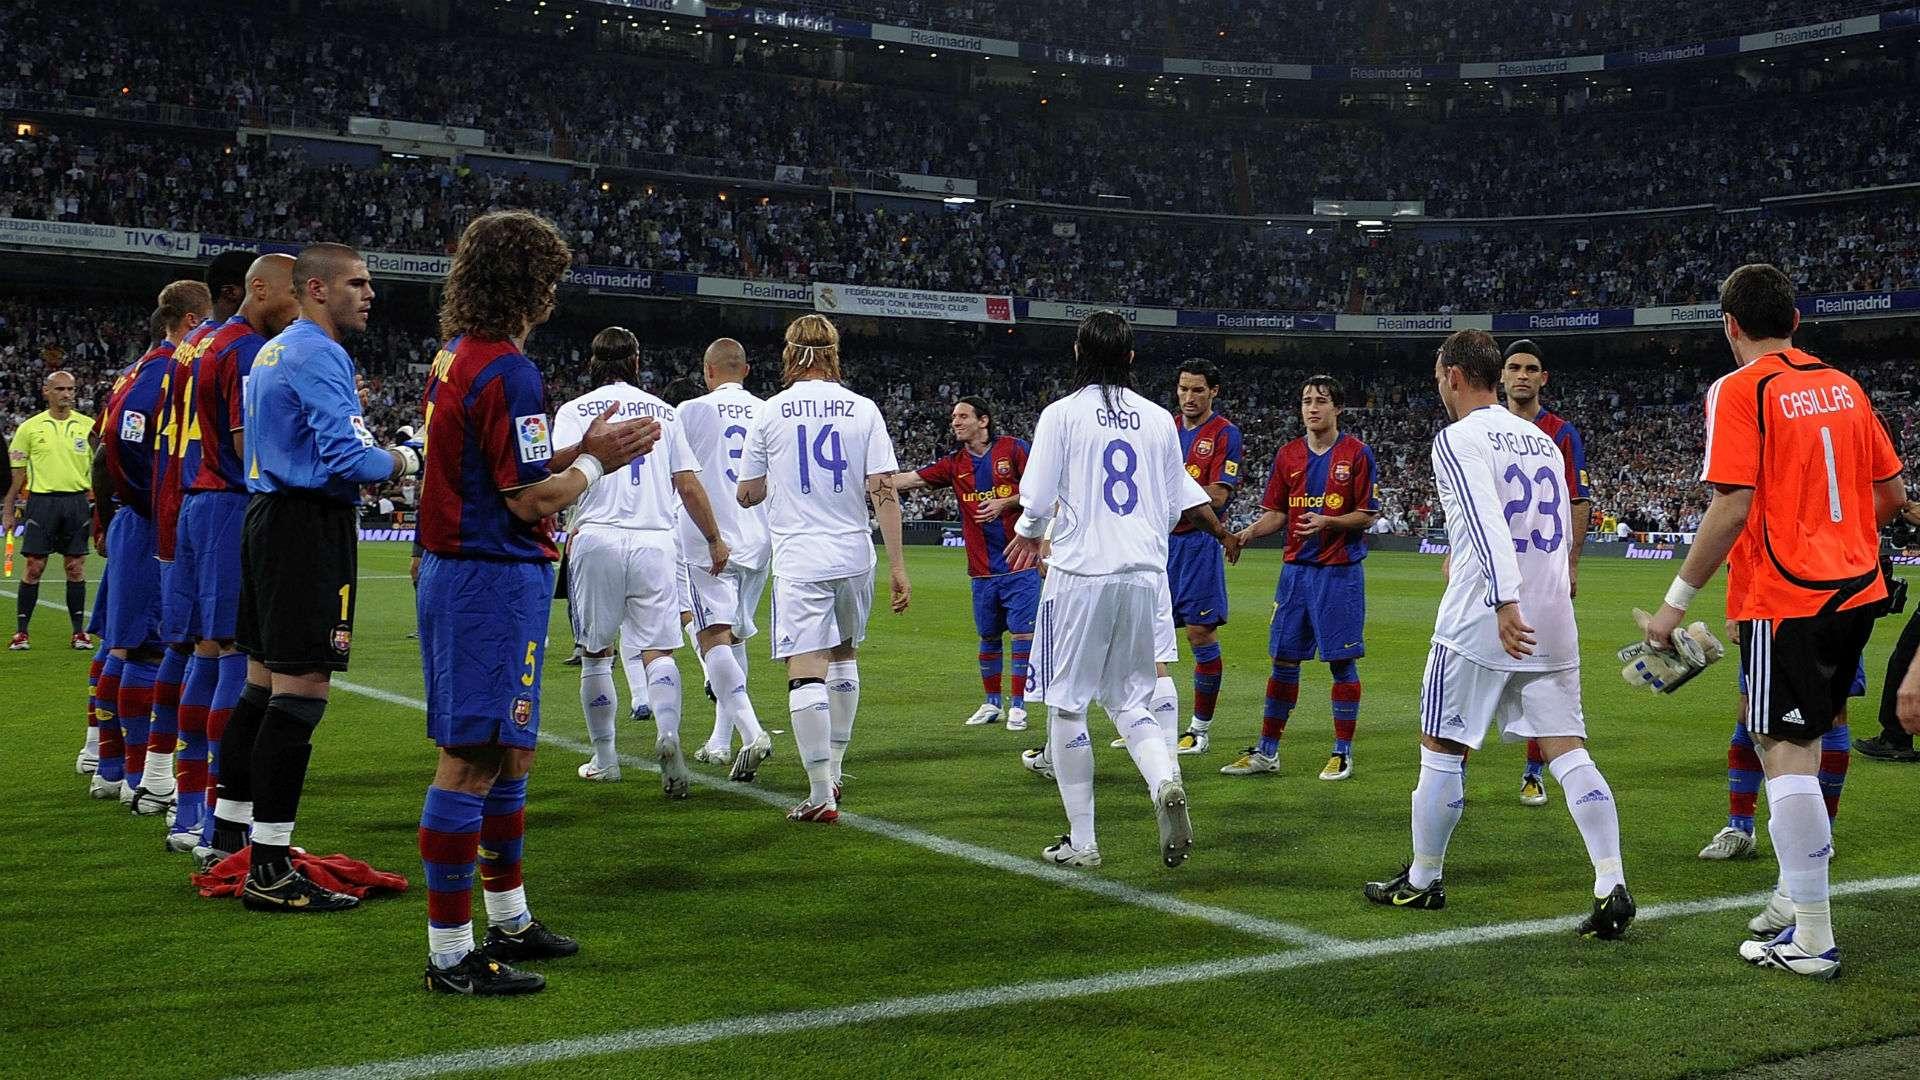 2008 год матч реал мадрид барселона